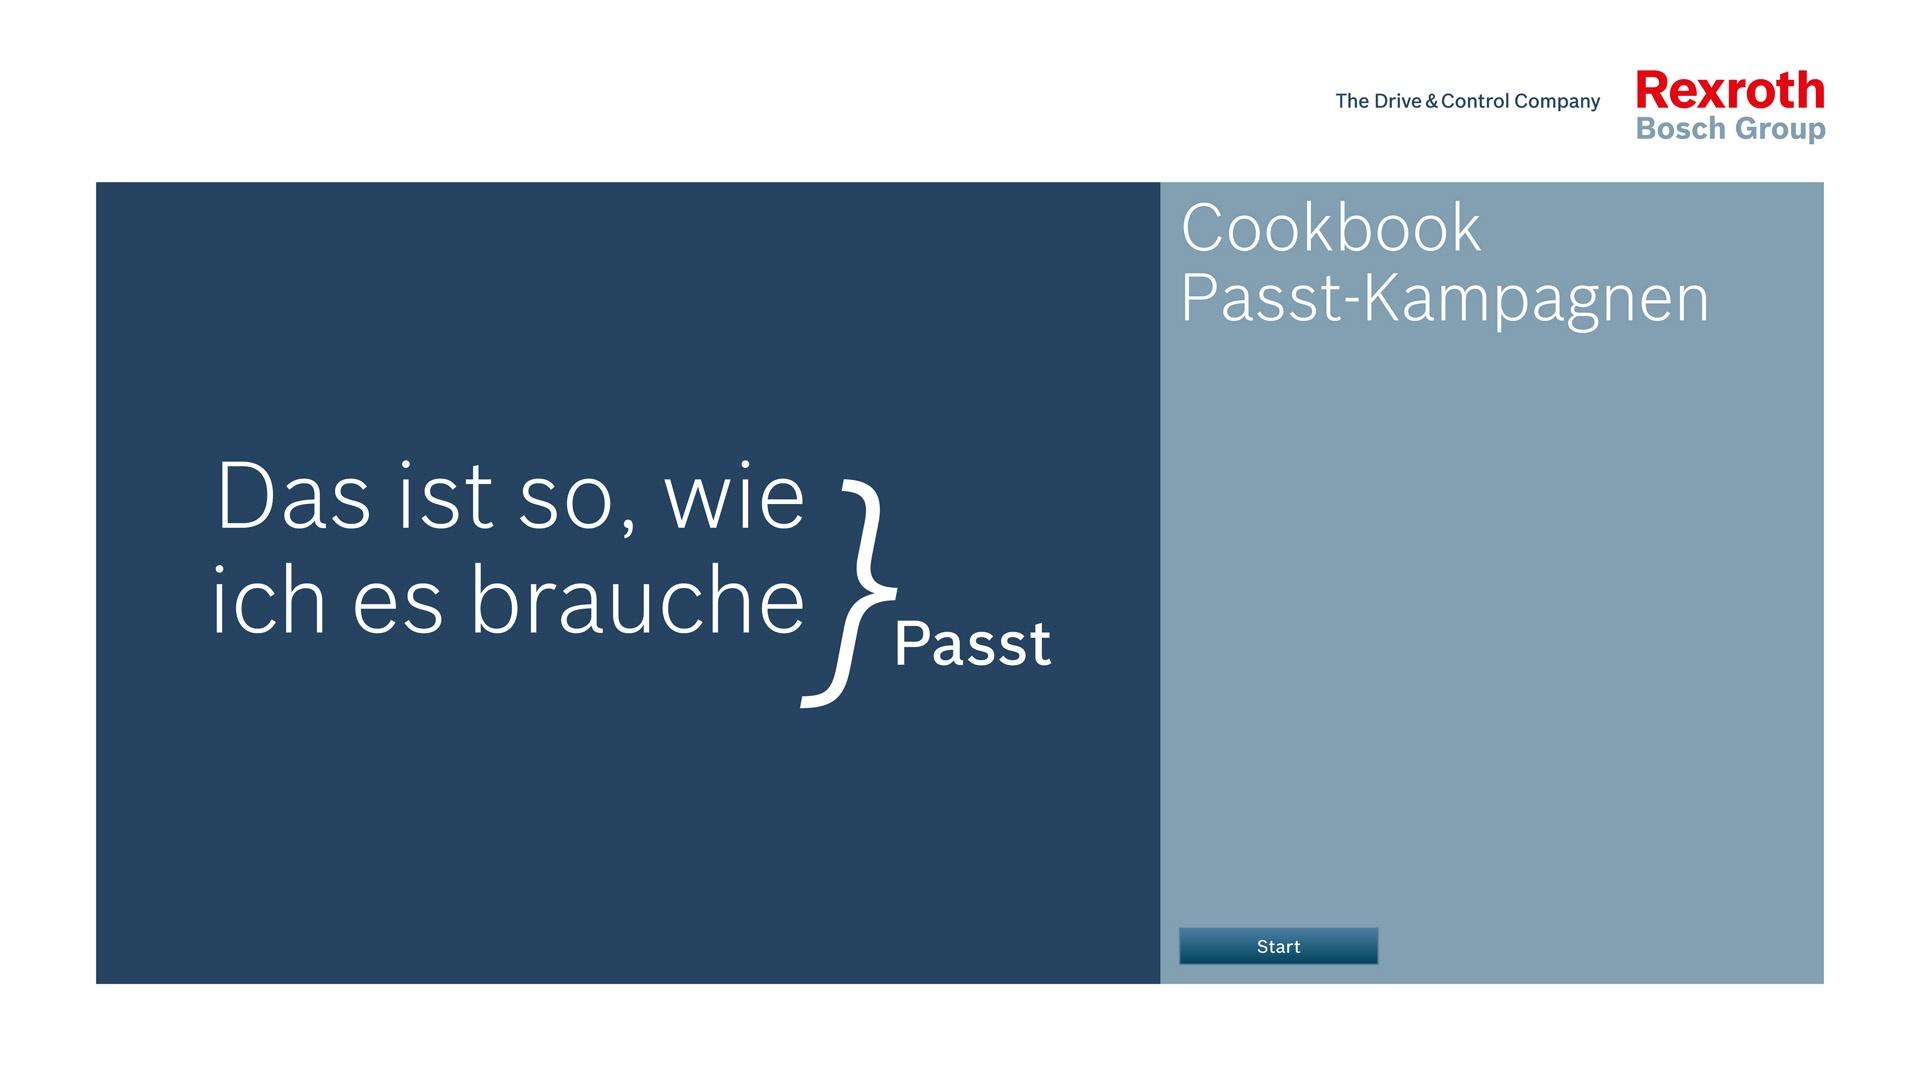 Corporate Design Passt Kampagne Bosch Rexroth